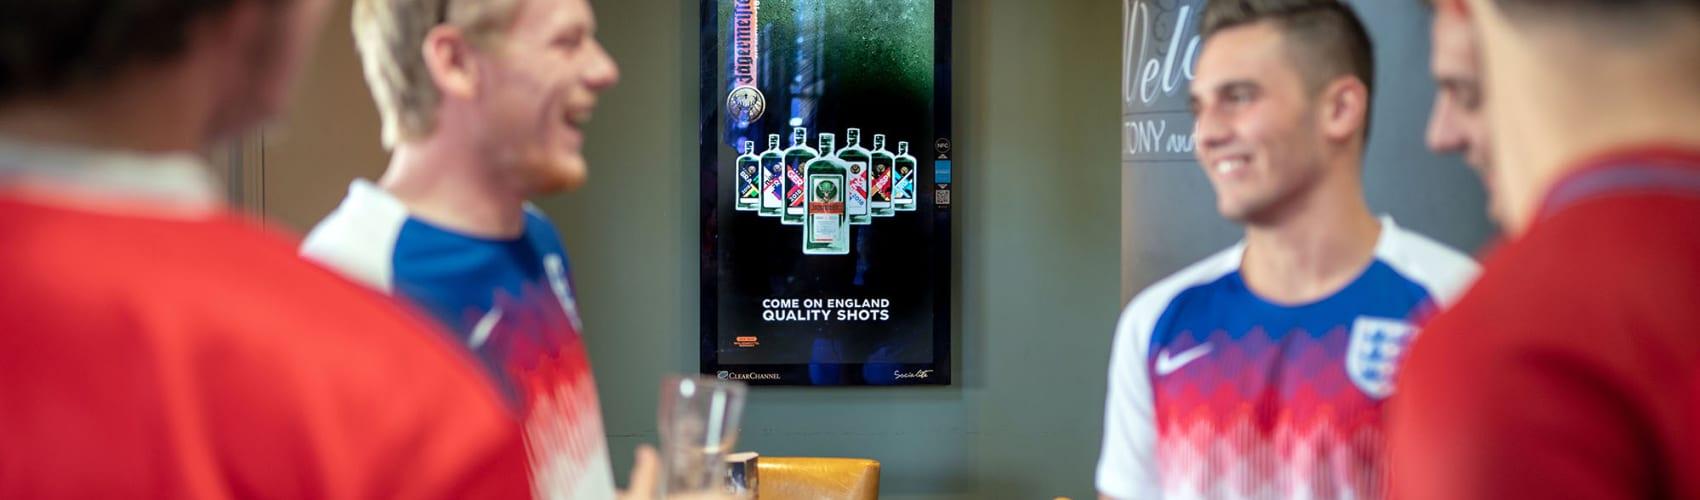 Socialite screen in a bar